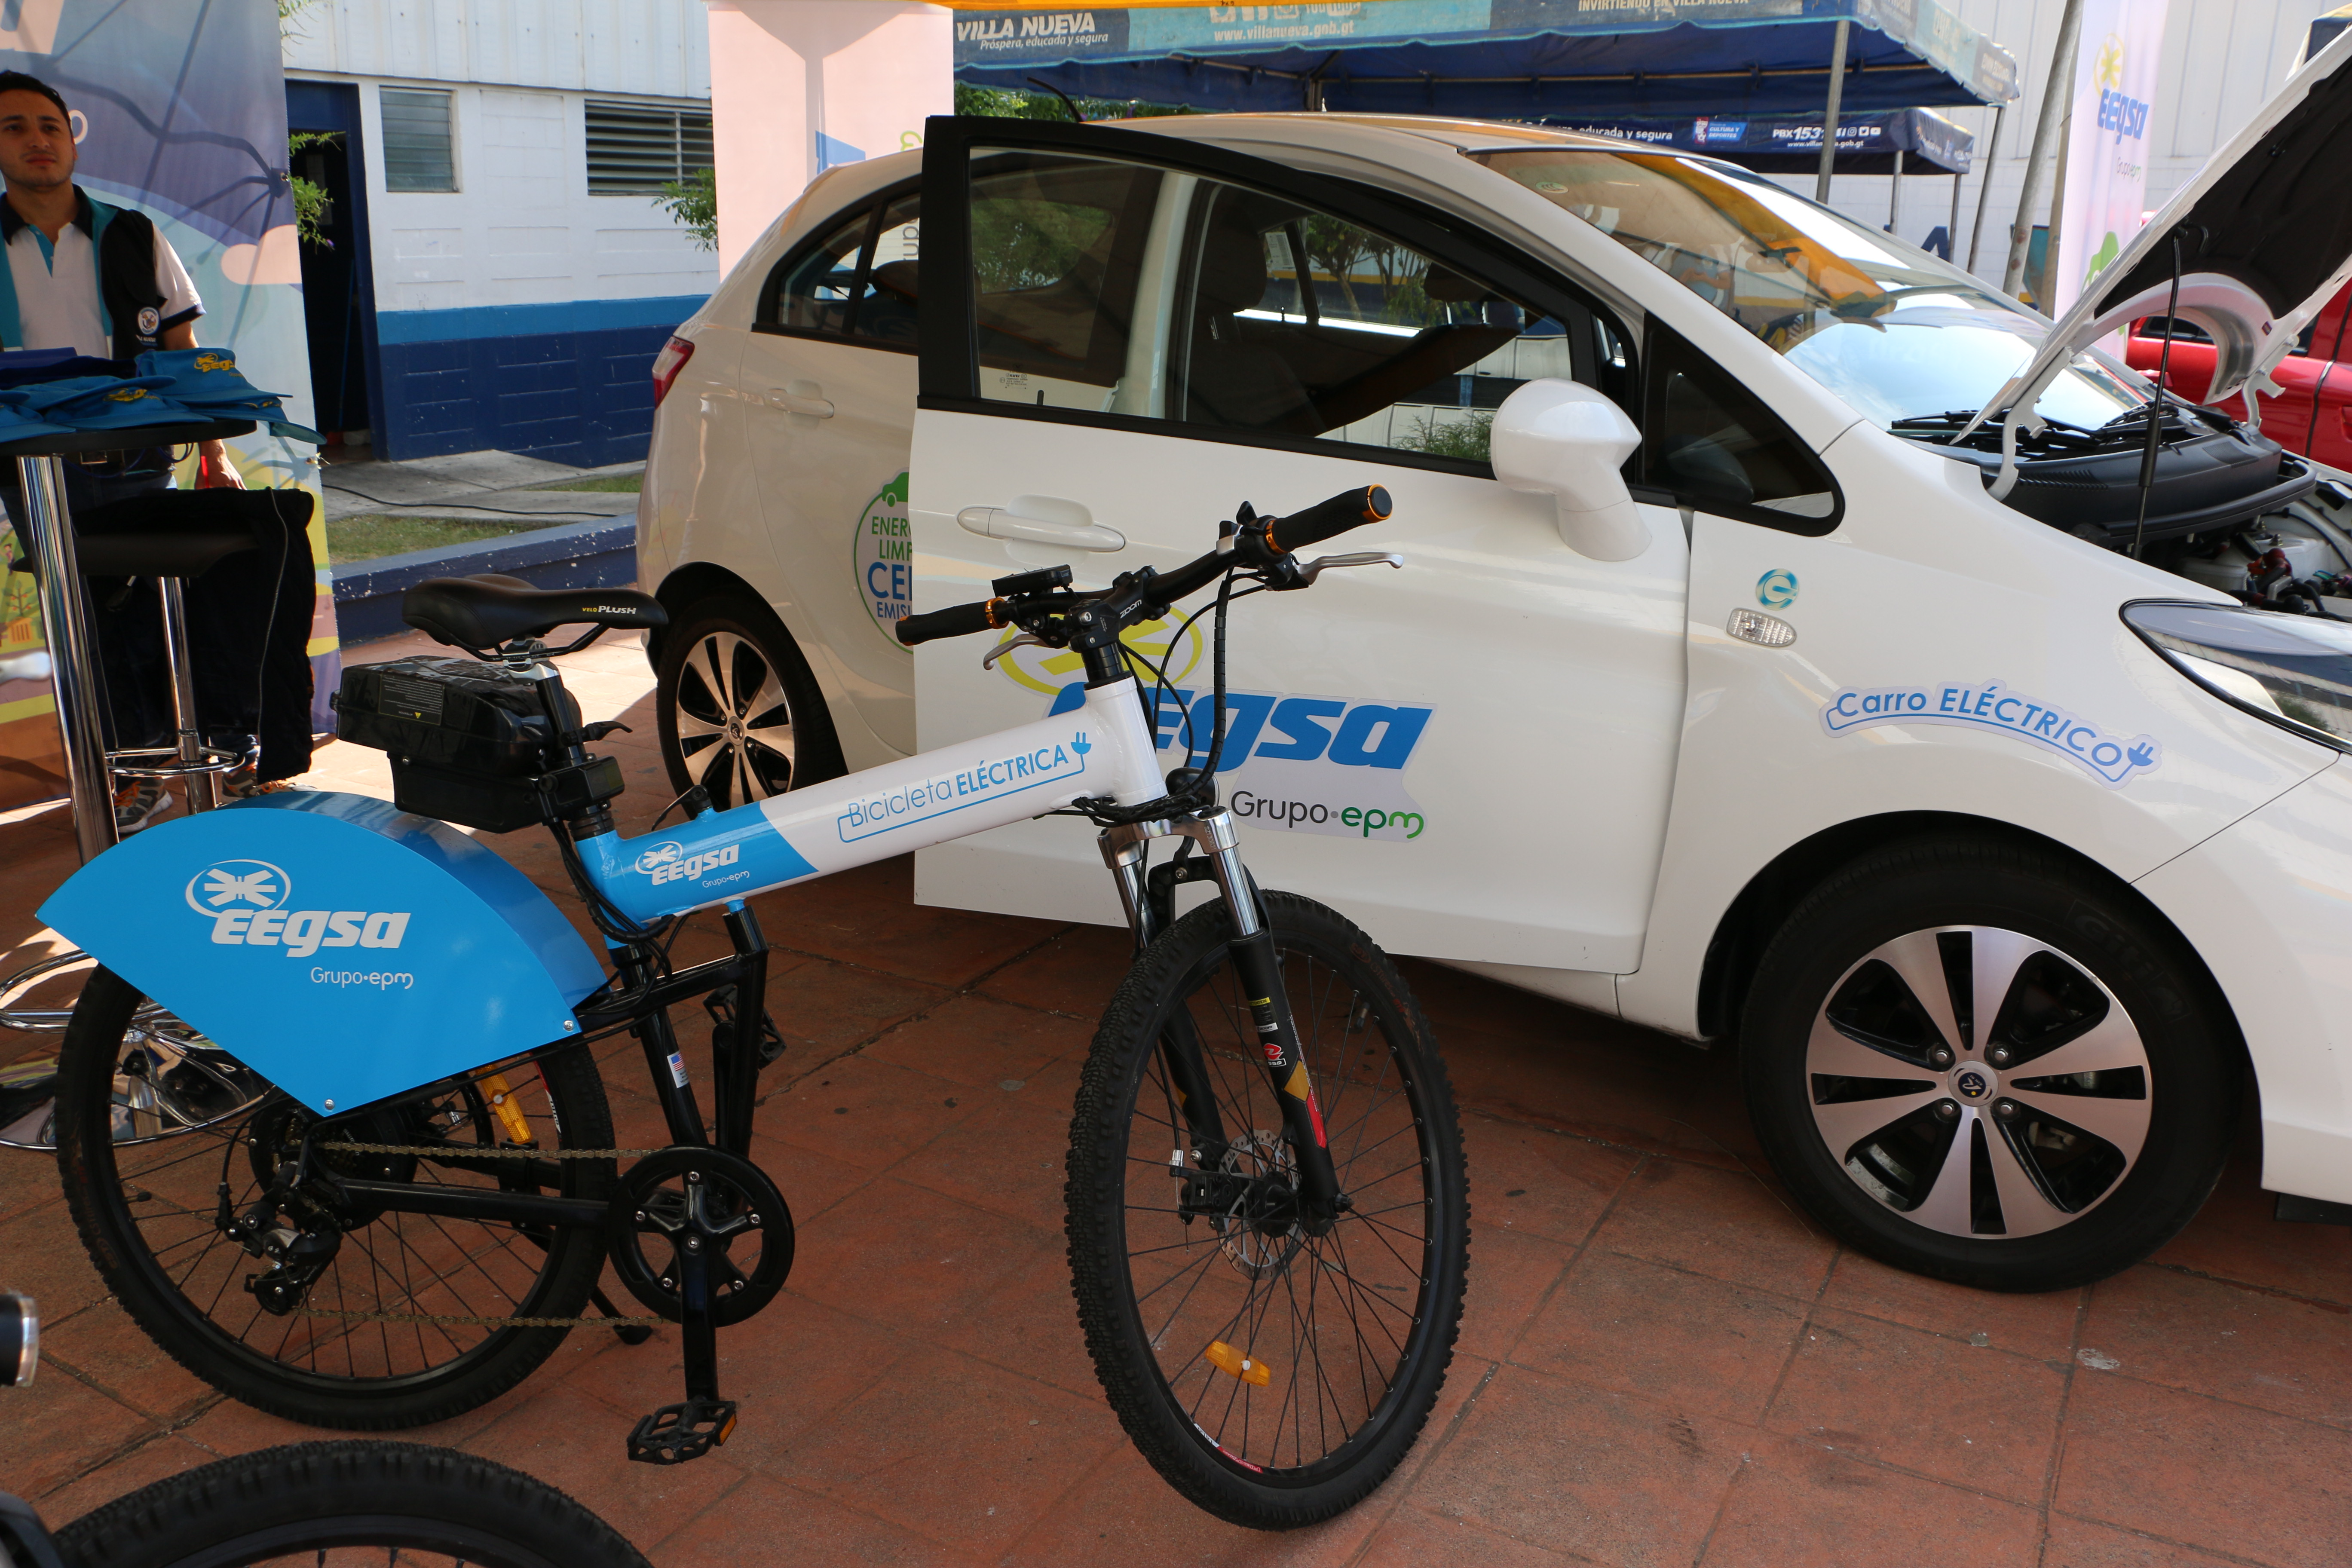 https://eegsa.com/wp-content/uploads/2019/06/carro-y-bicicleta.jpg